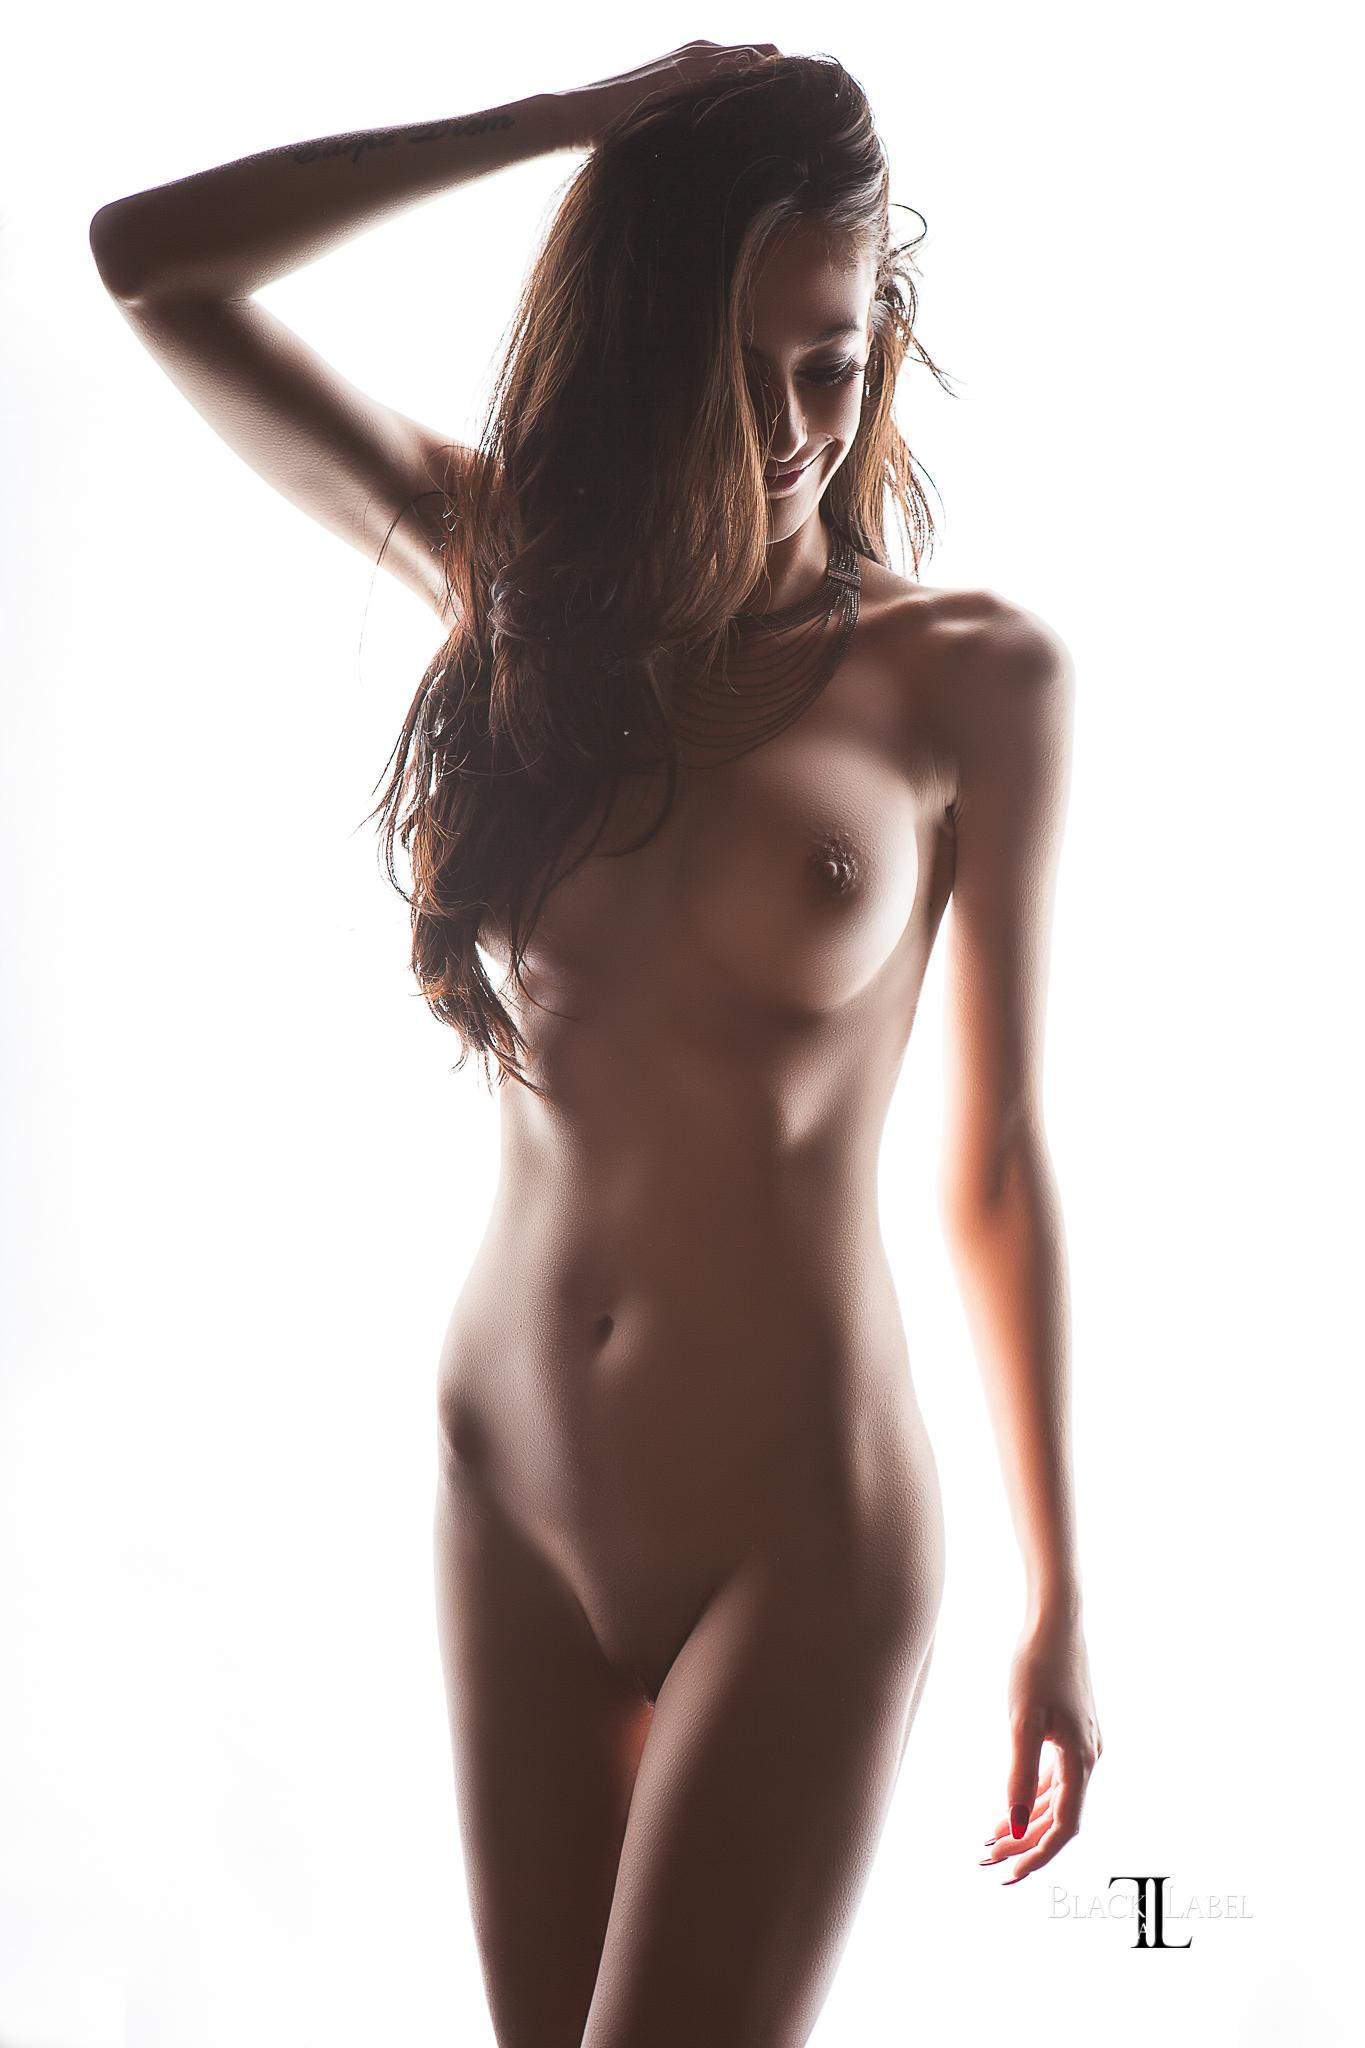 Naked girls, big tits, playmates, kiki van hees, nude art, nude girls, black label magazine